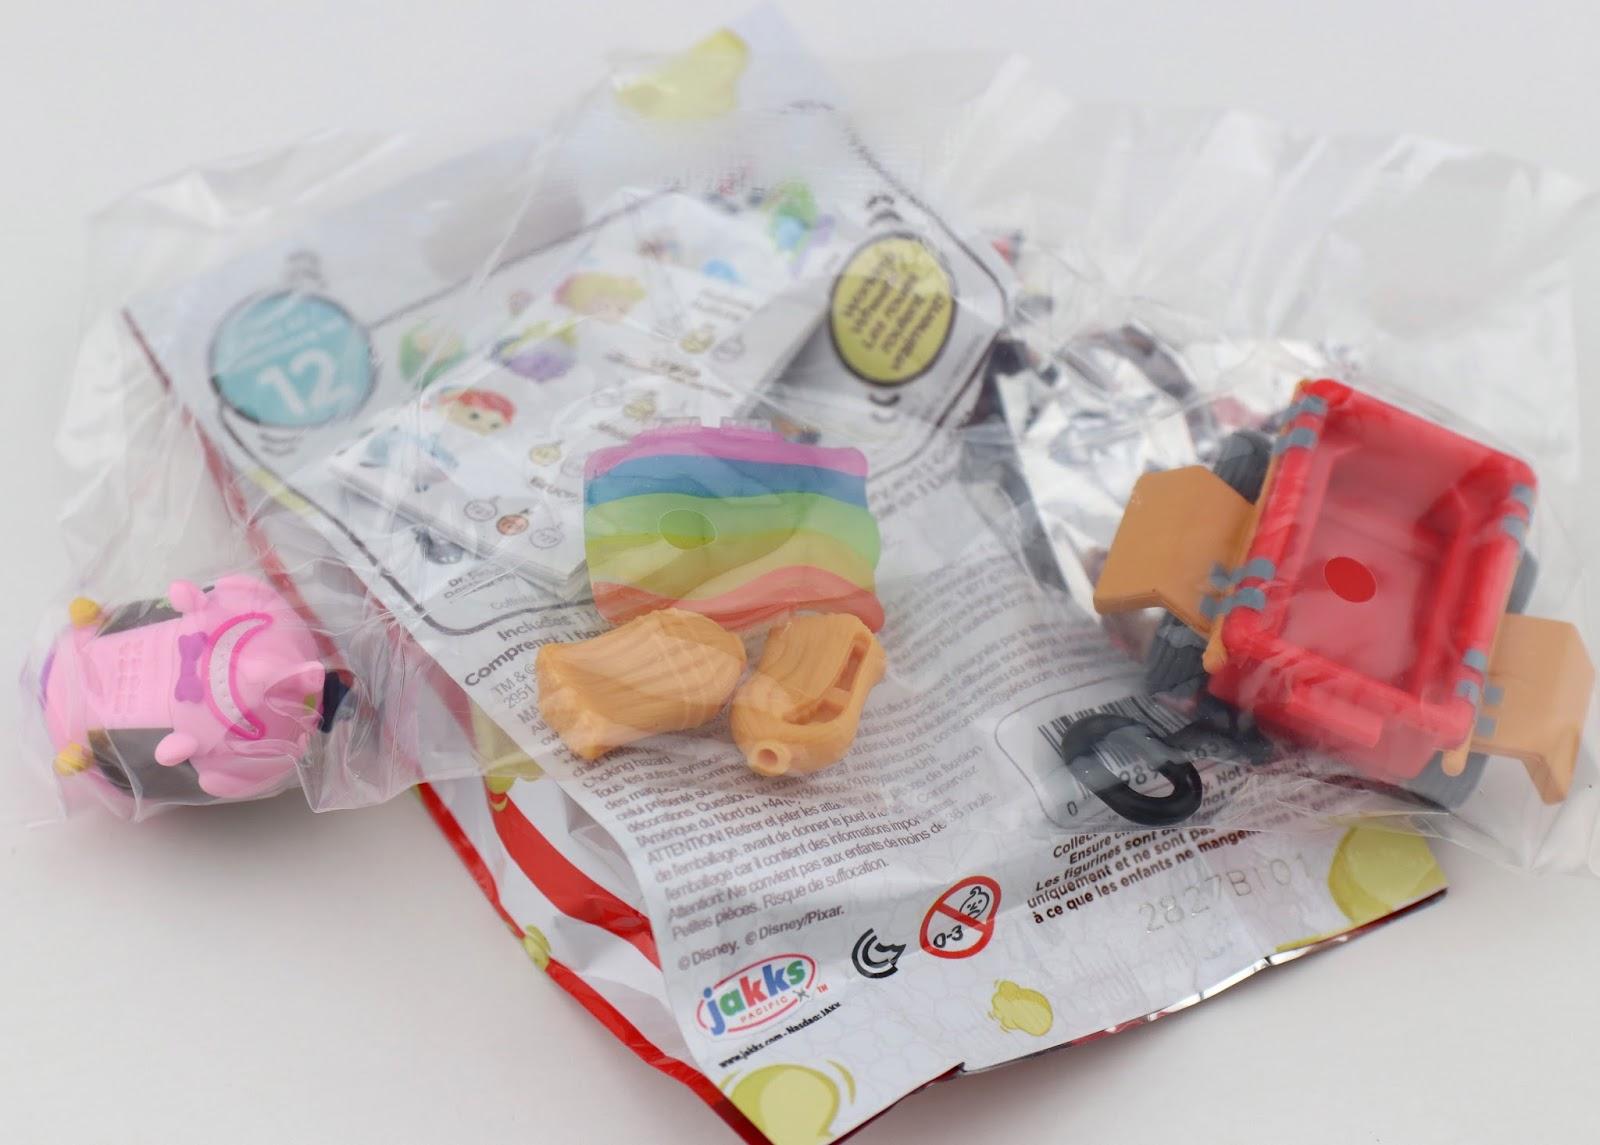 Disney Tsum Tsum Mystery Packs by Jakks Pacific Series 9 Pixar bing bong